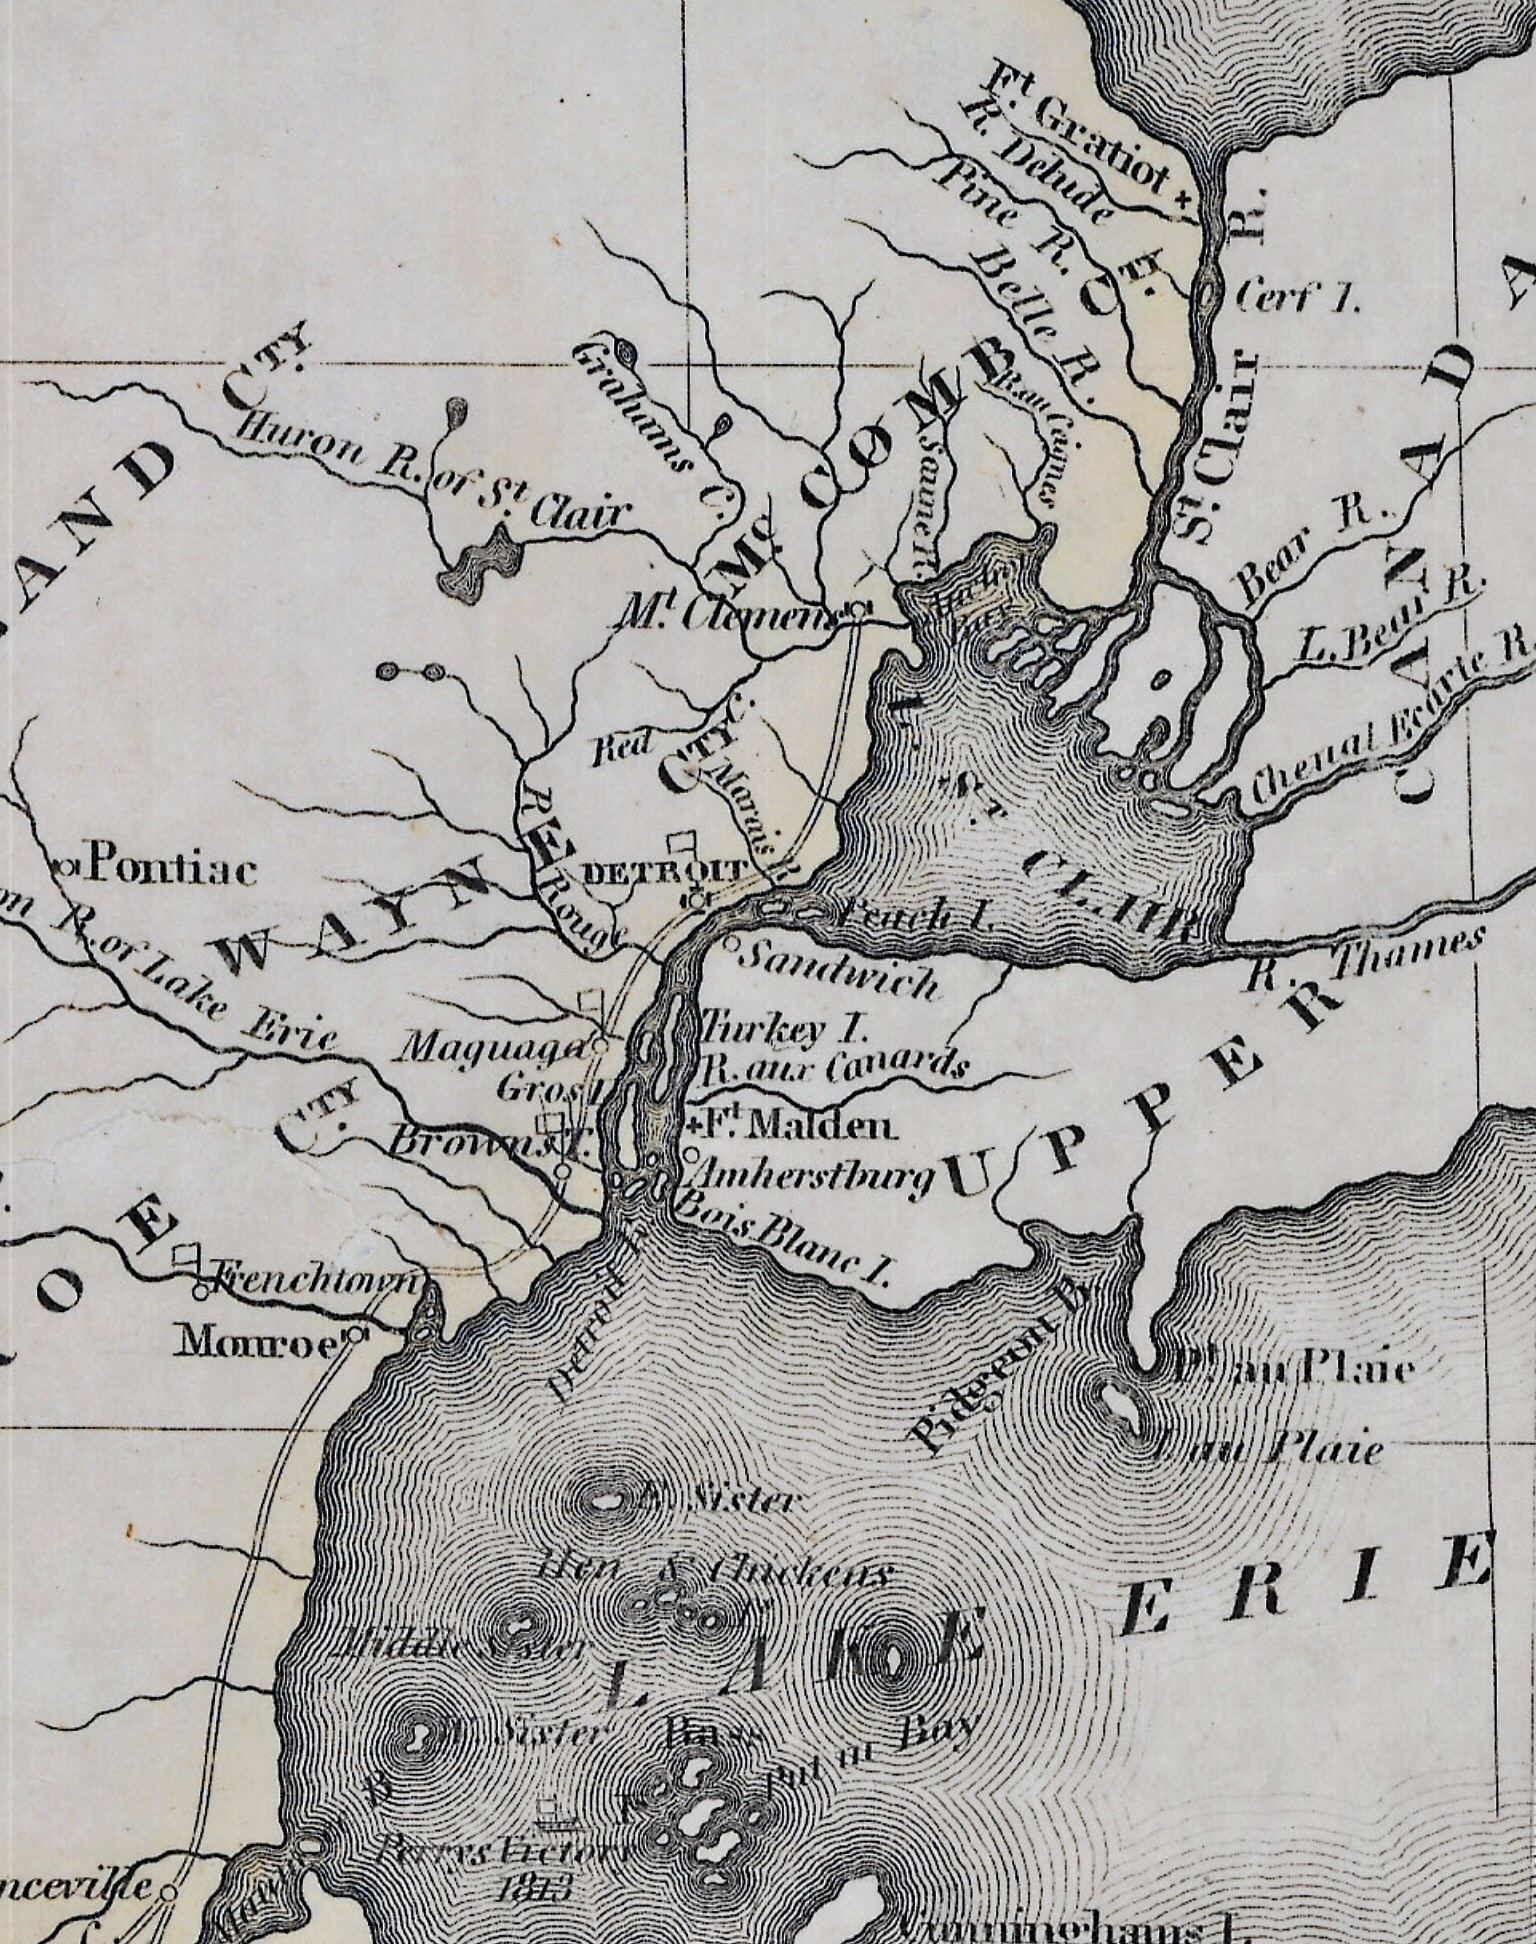 Michigan Territory Map 1822